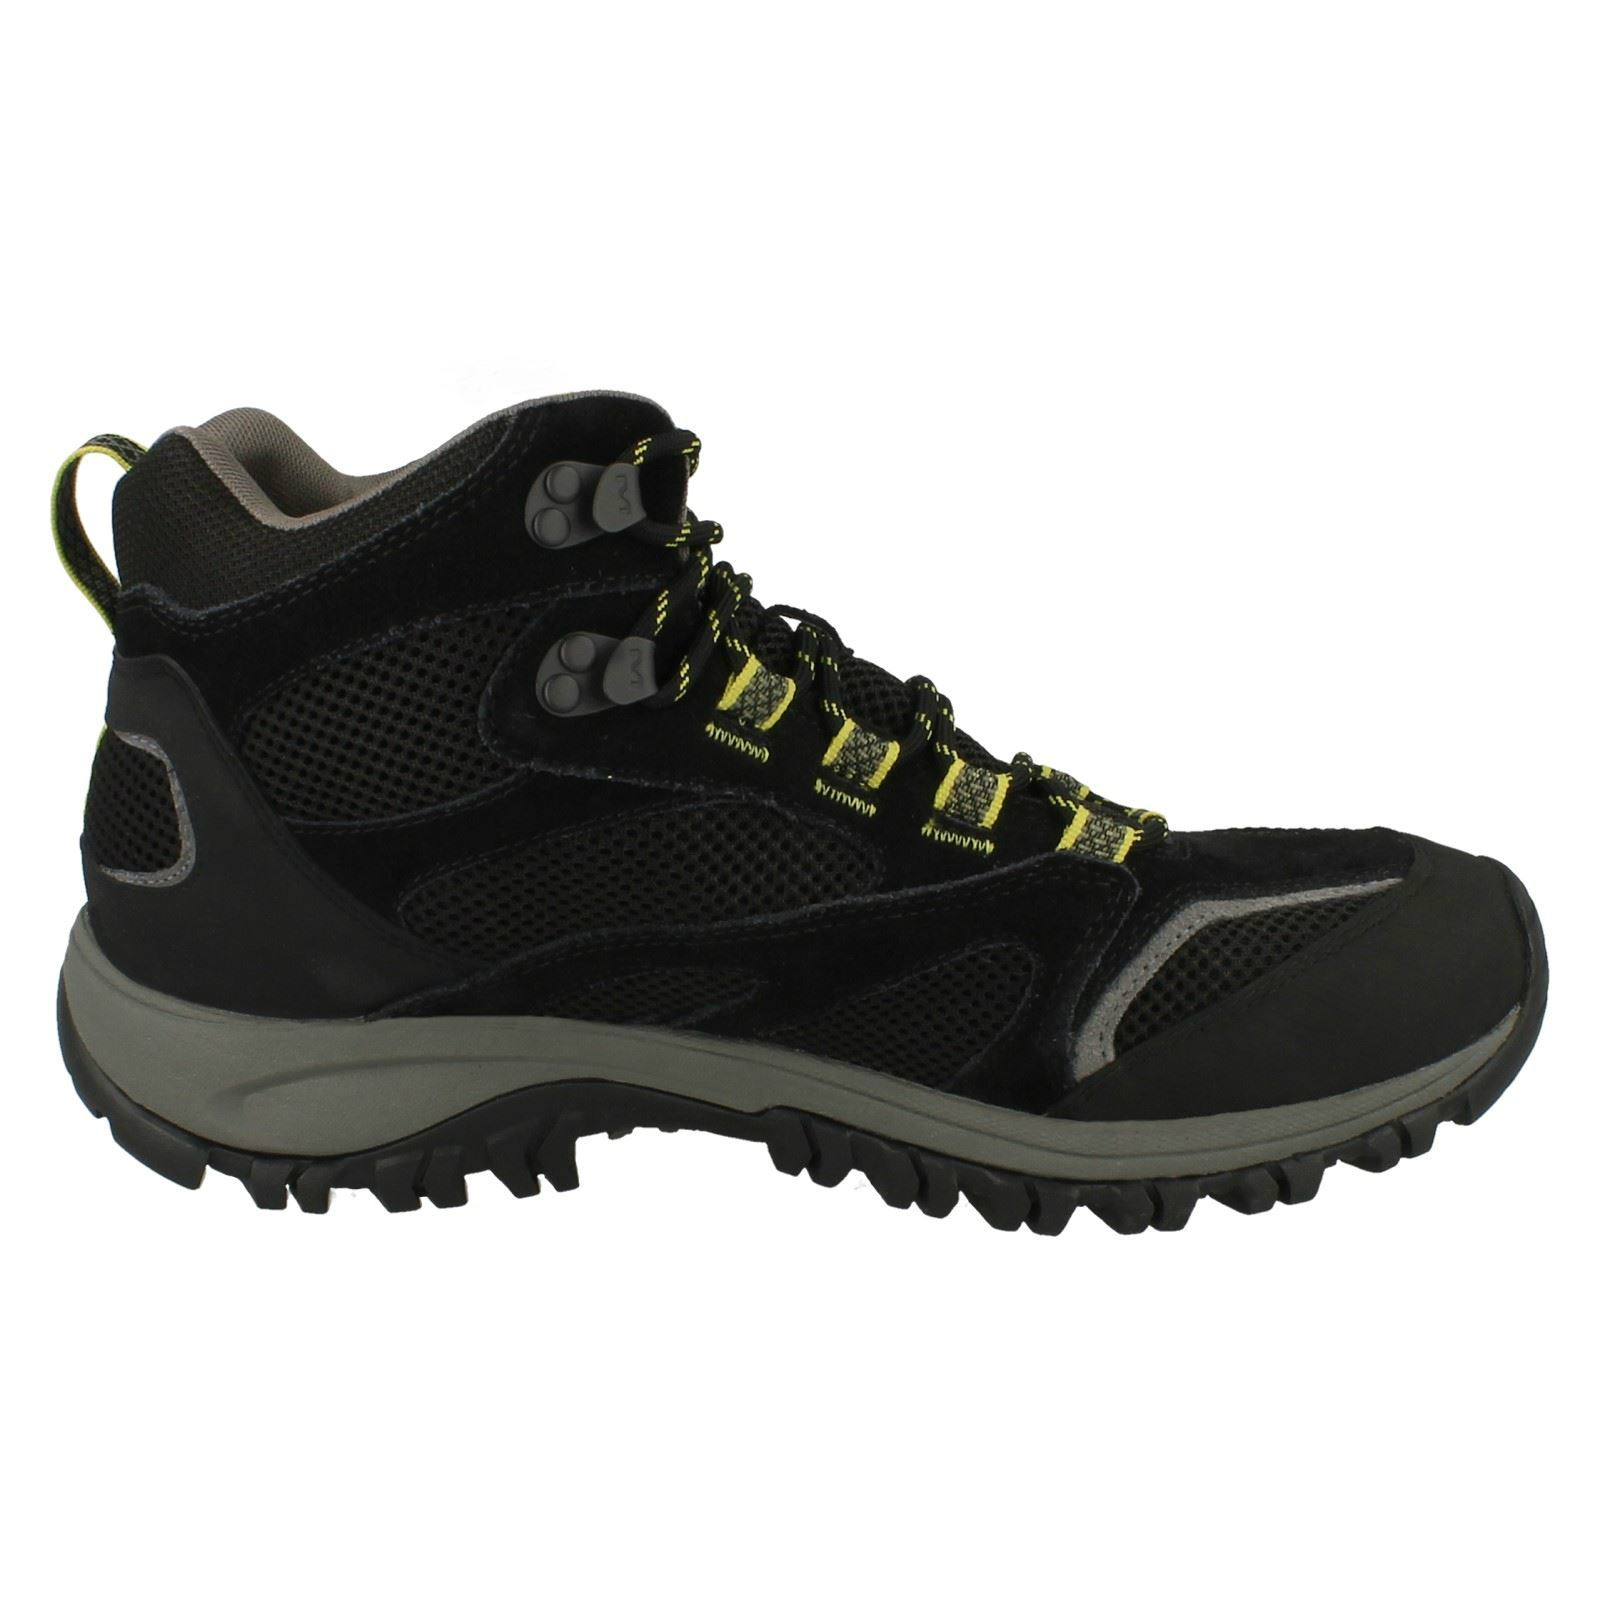 thumbnail 7 - Mens-Merrell-Waterproof-Walking-Boots-Phoenix-Mid